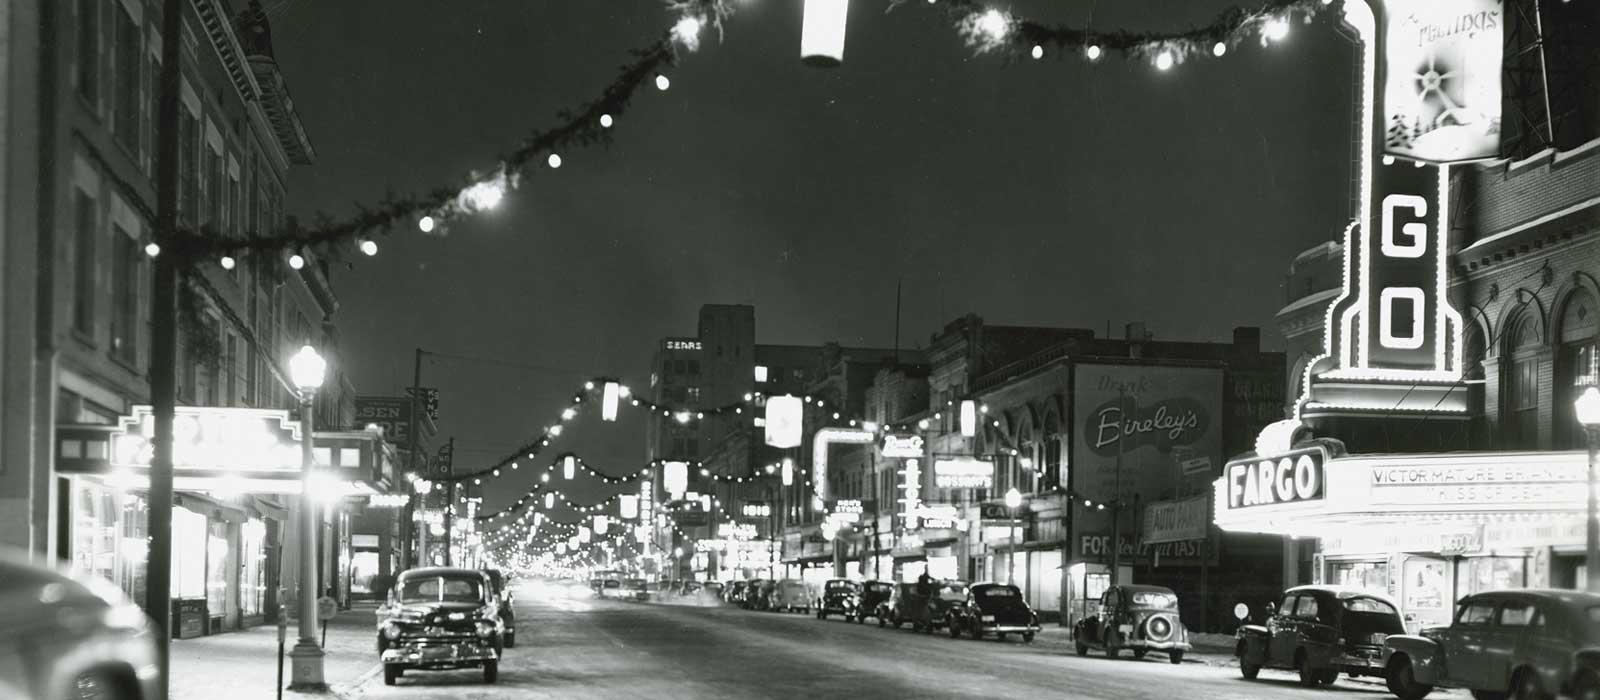 Downtown Fargo - Winter